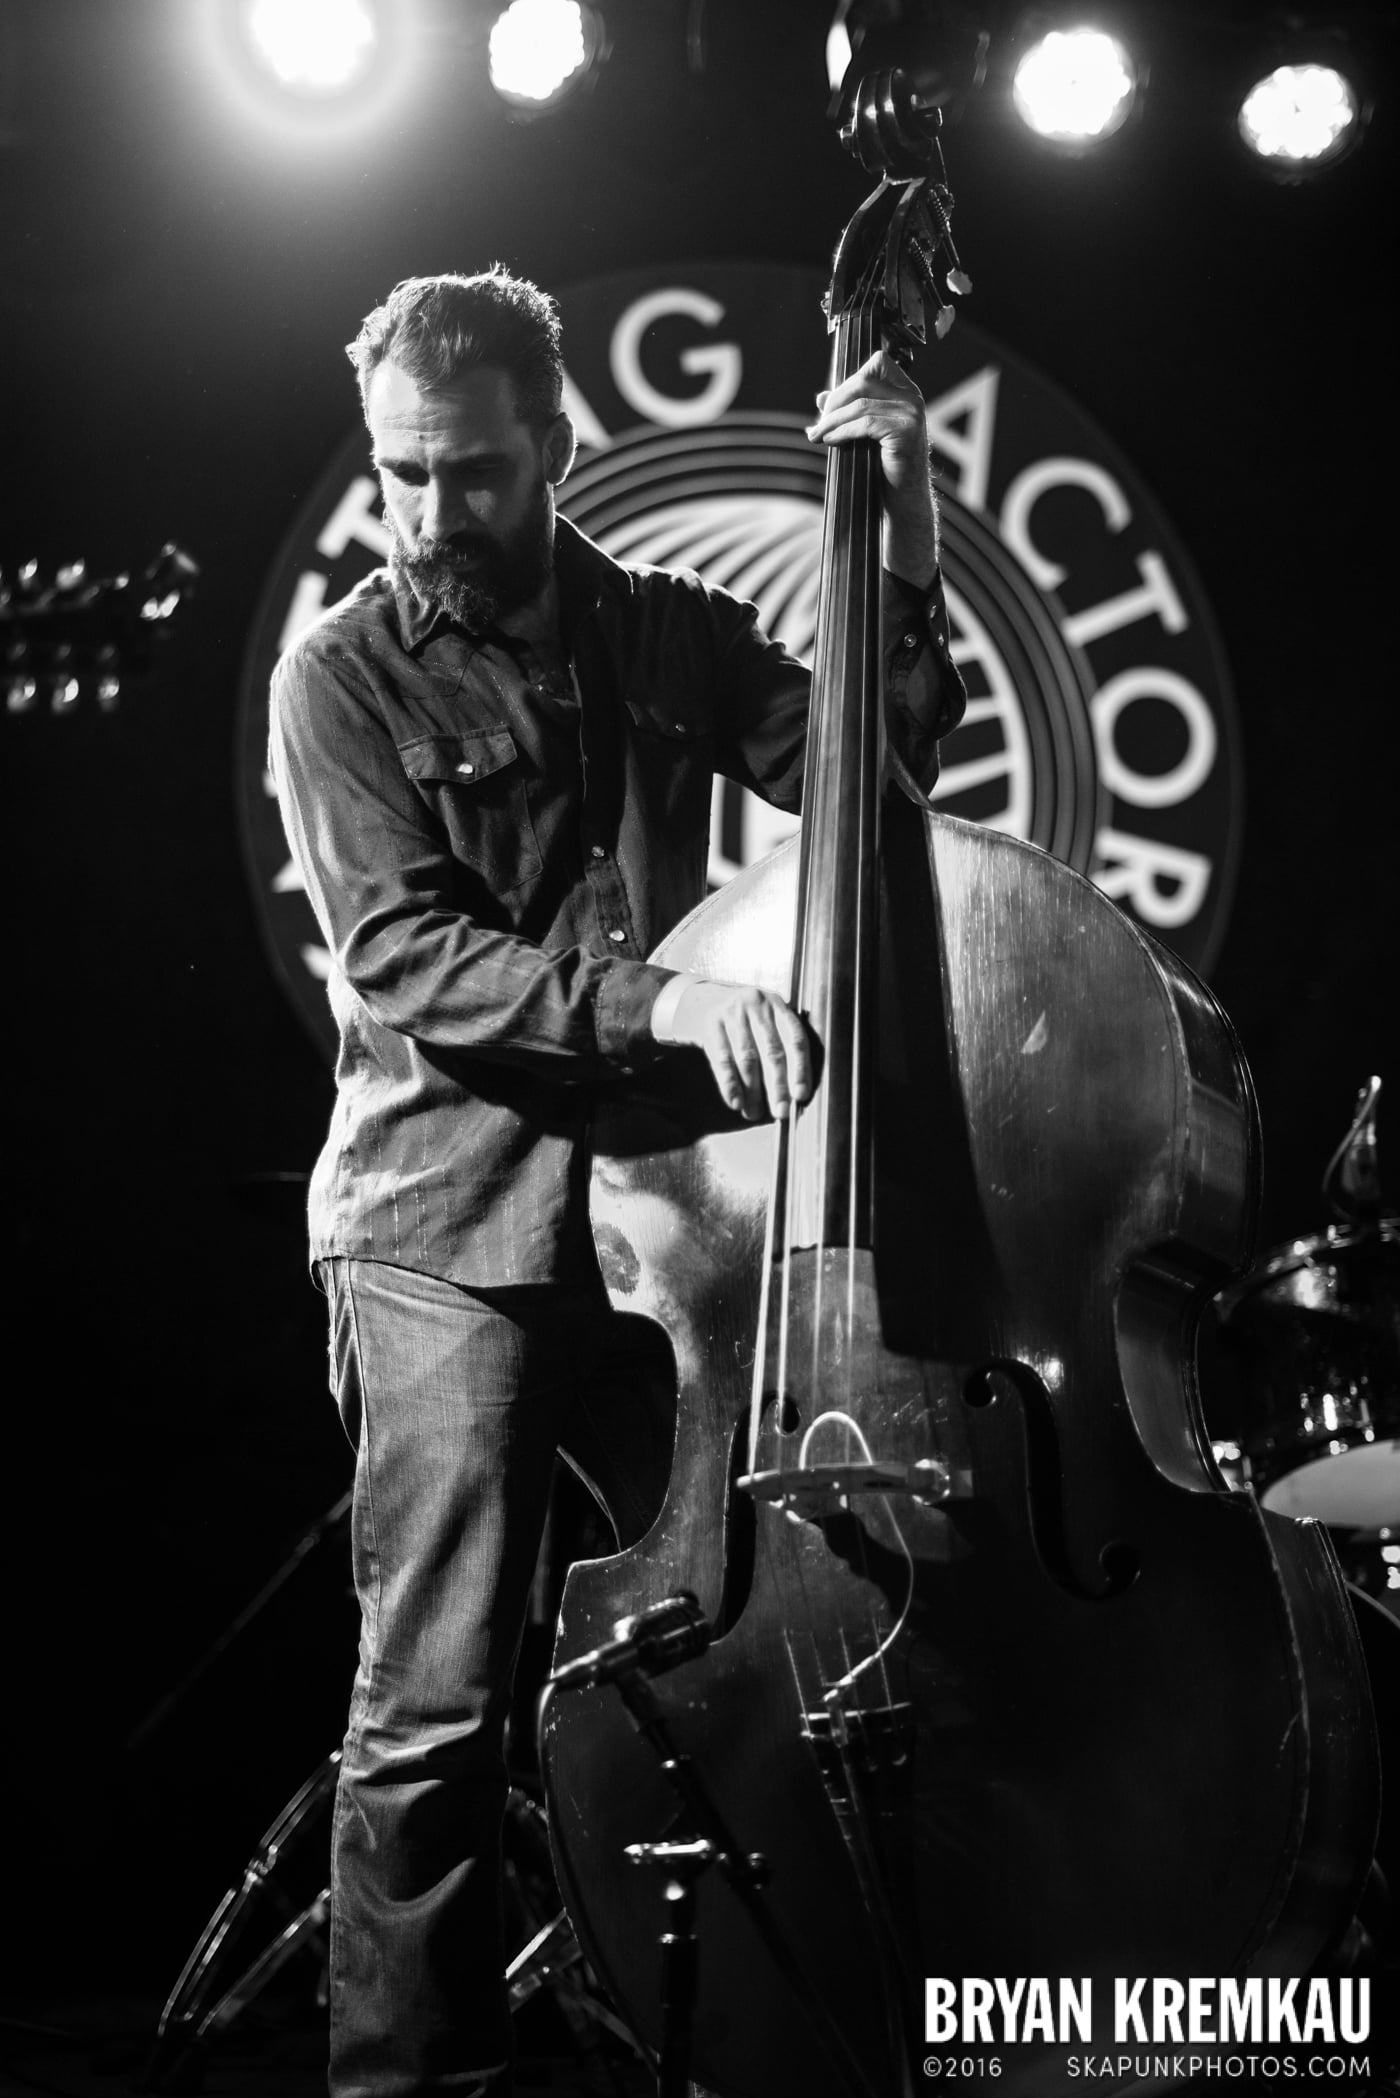 Danny Burns Band @ Knitting Factory, Brooklyn, NY - 9.10.14 (11)